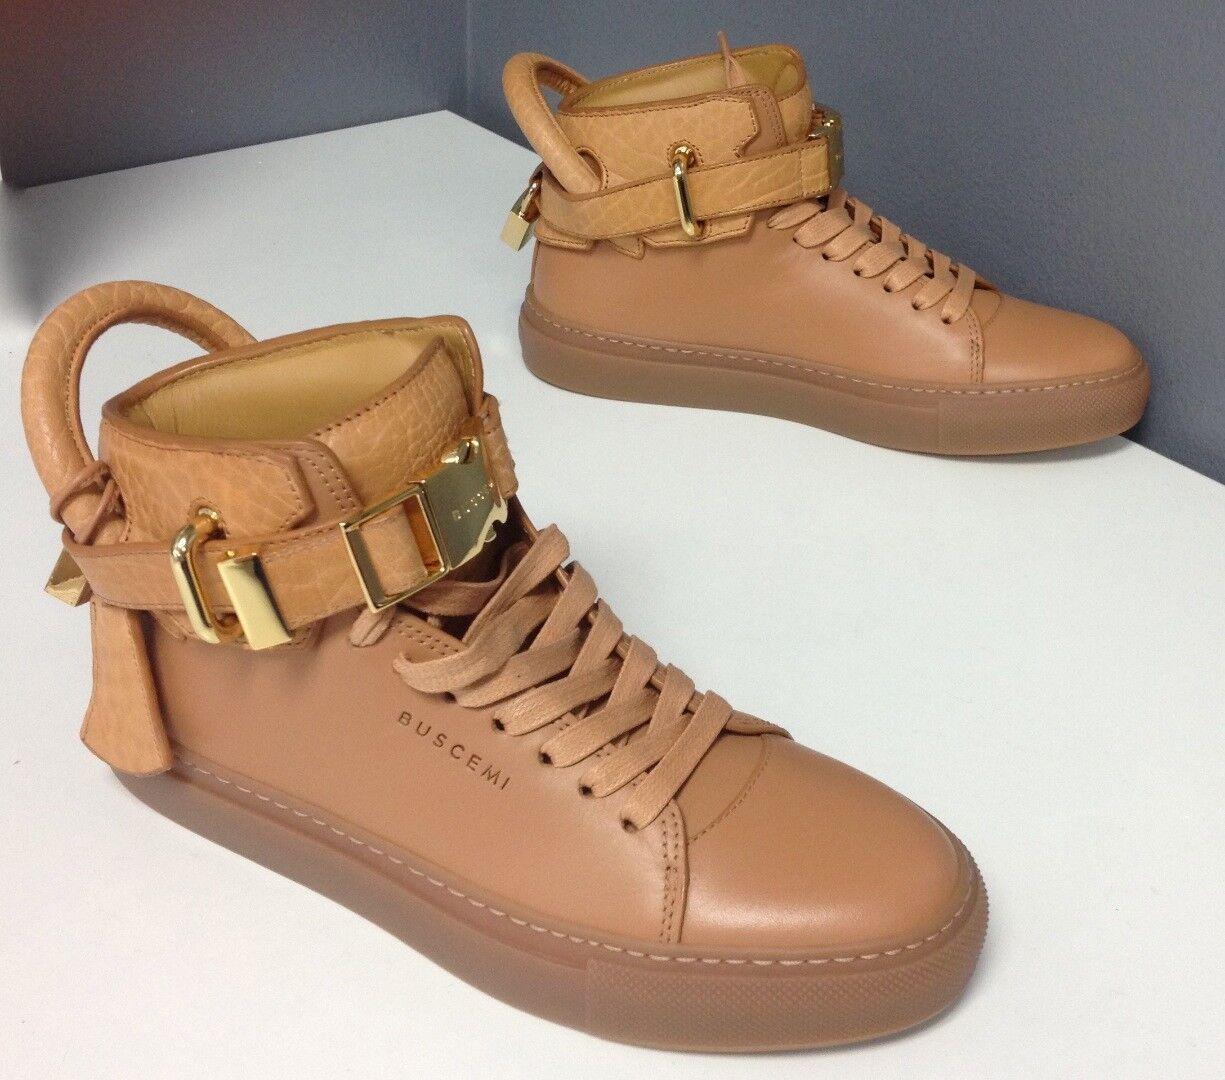 BUSCEMI NWOB Women Tan Leather Lace Up gold Tone Front Clip Sneaker Sz 36 B4504